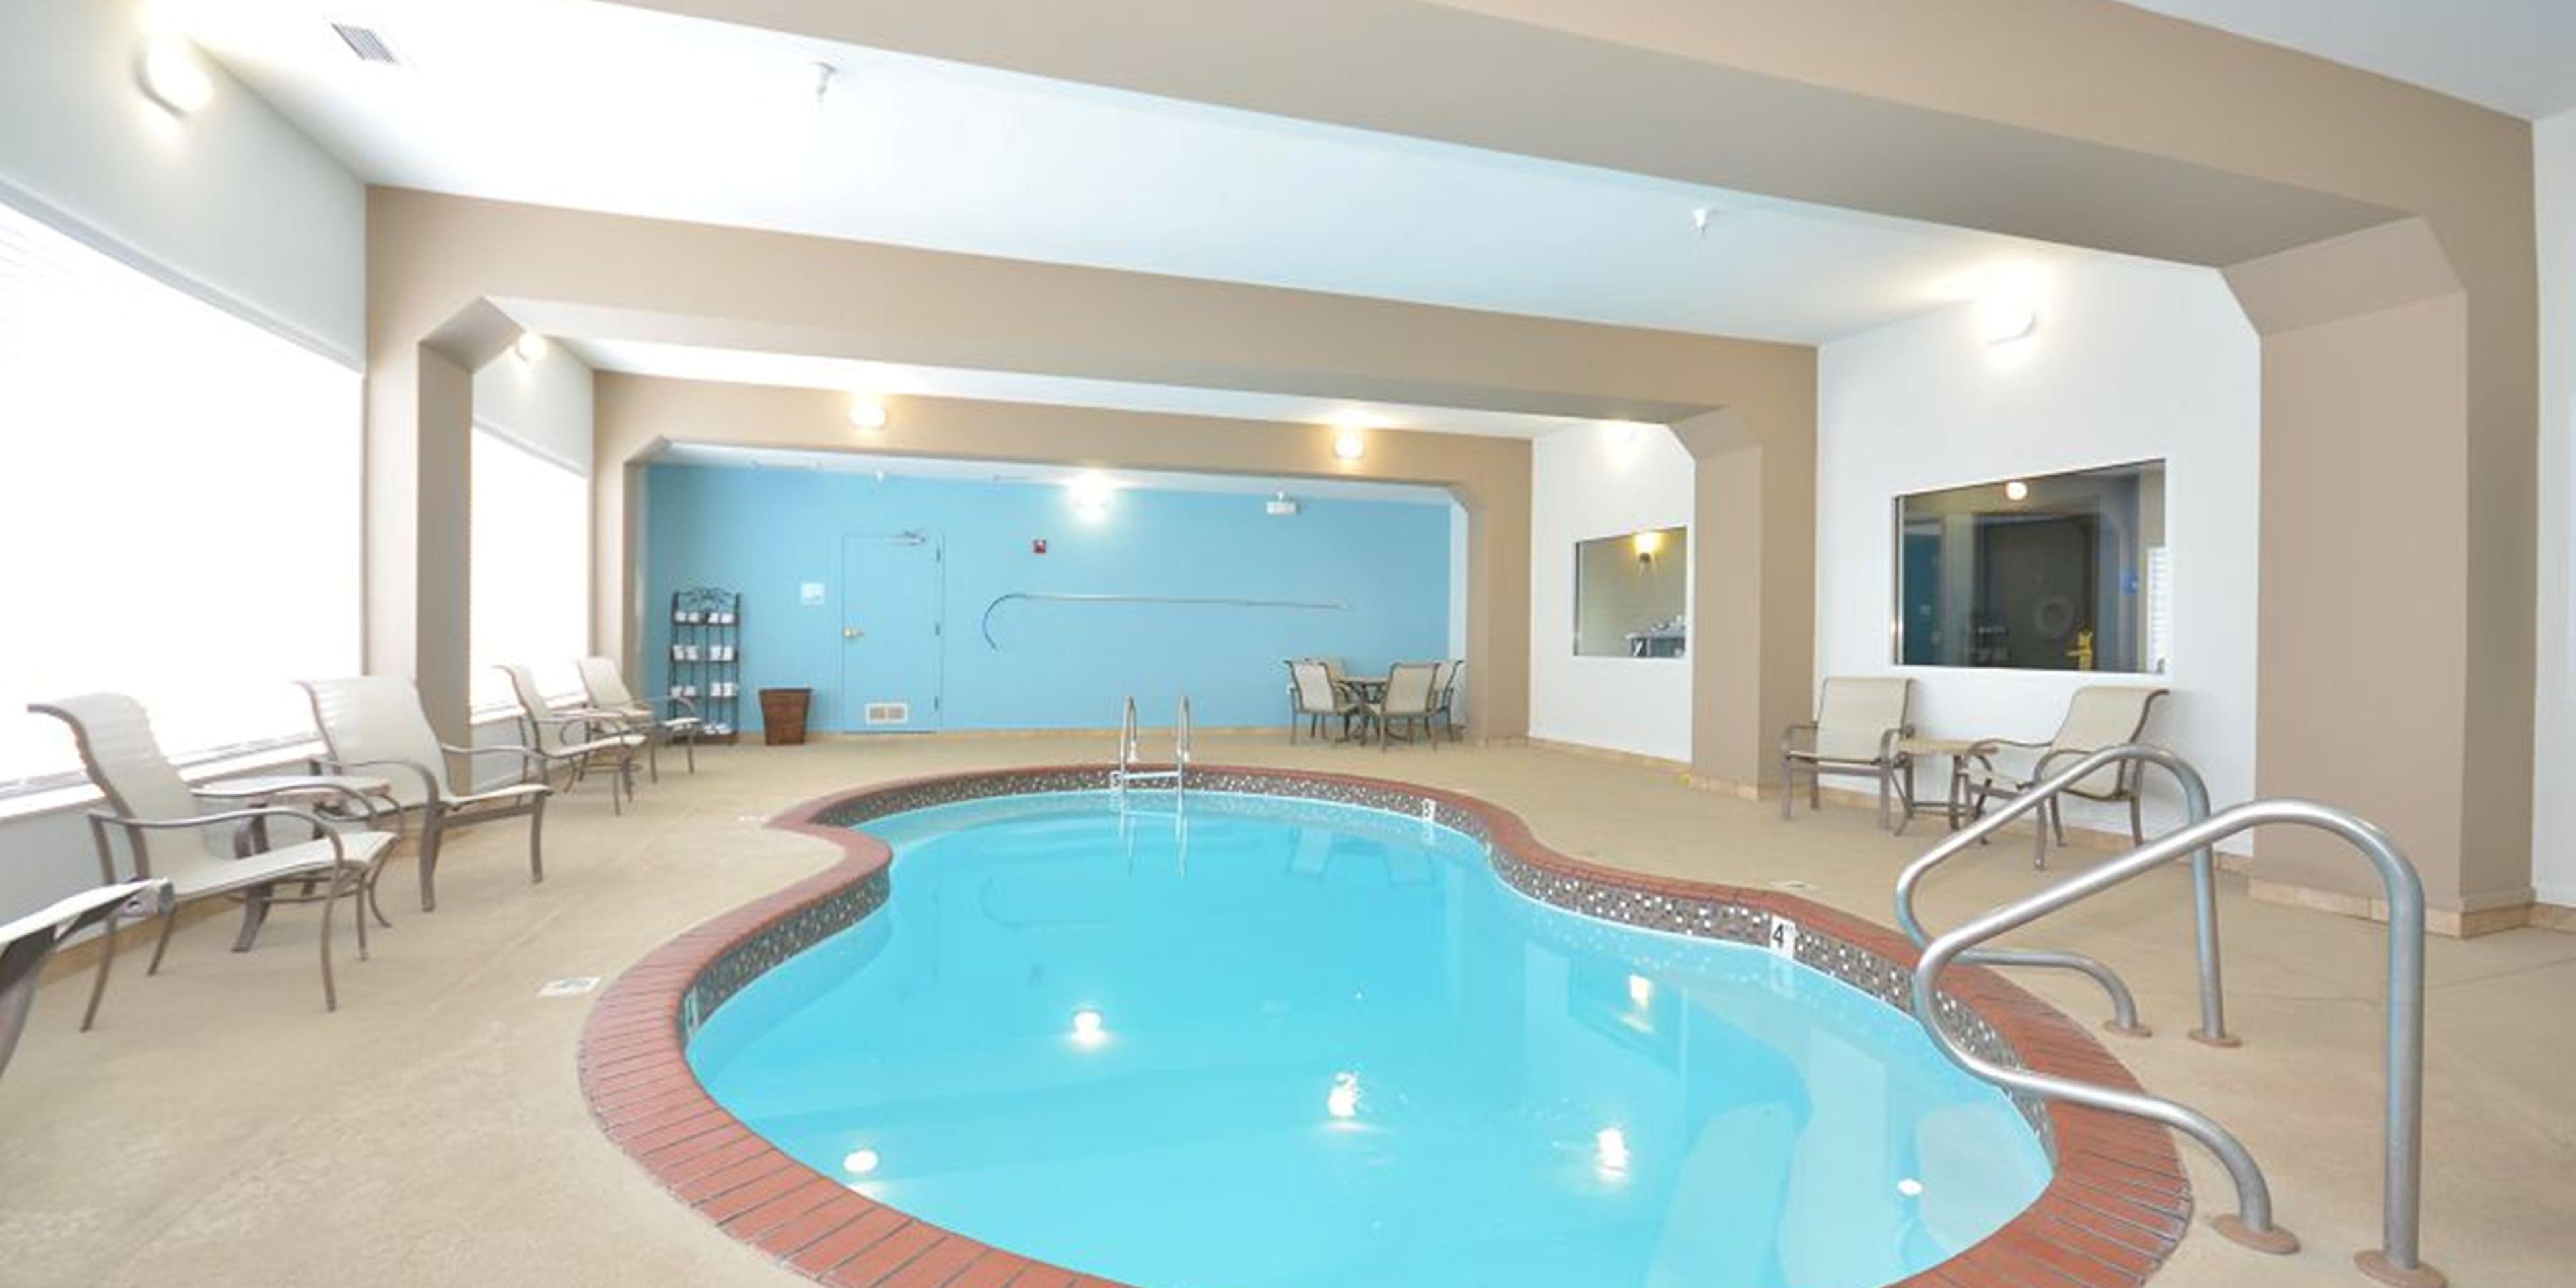 Holiday Inn Express And Suites Farmington 4162289934 2x1